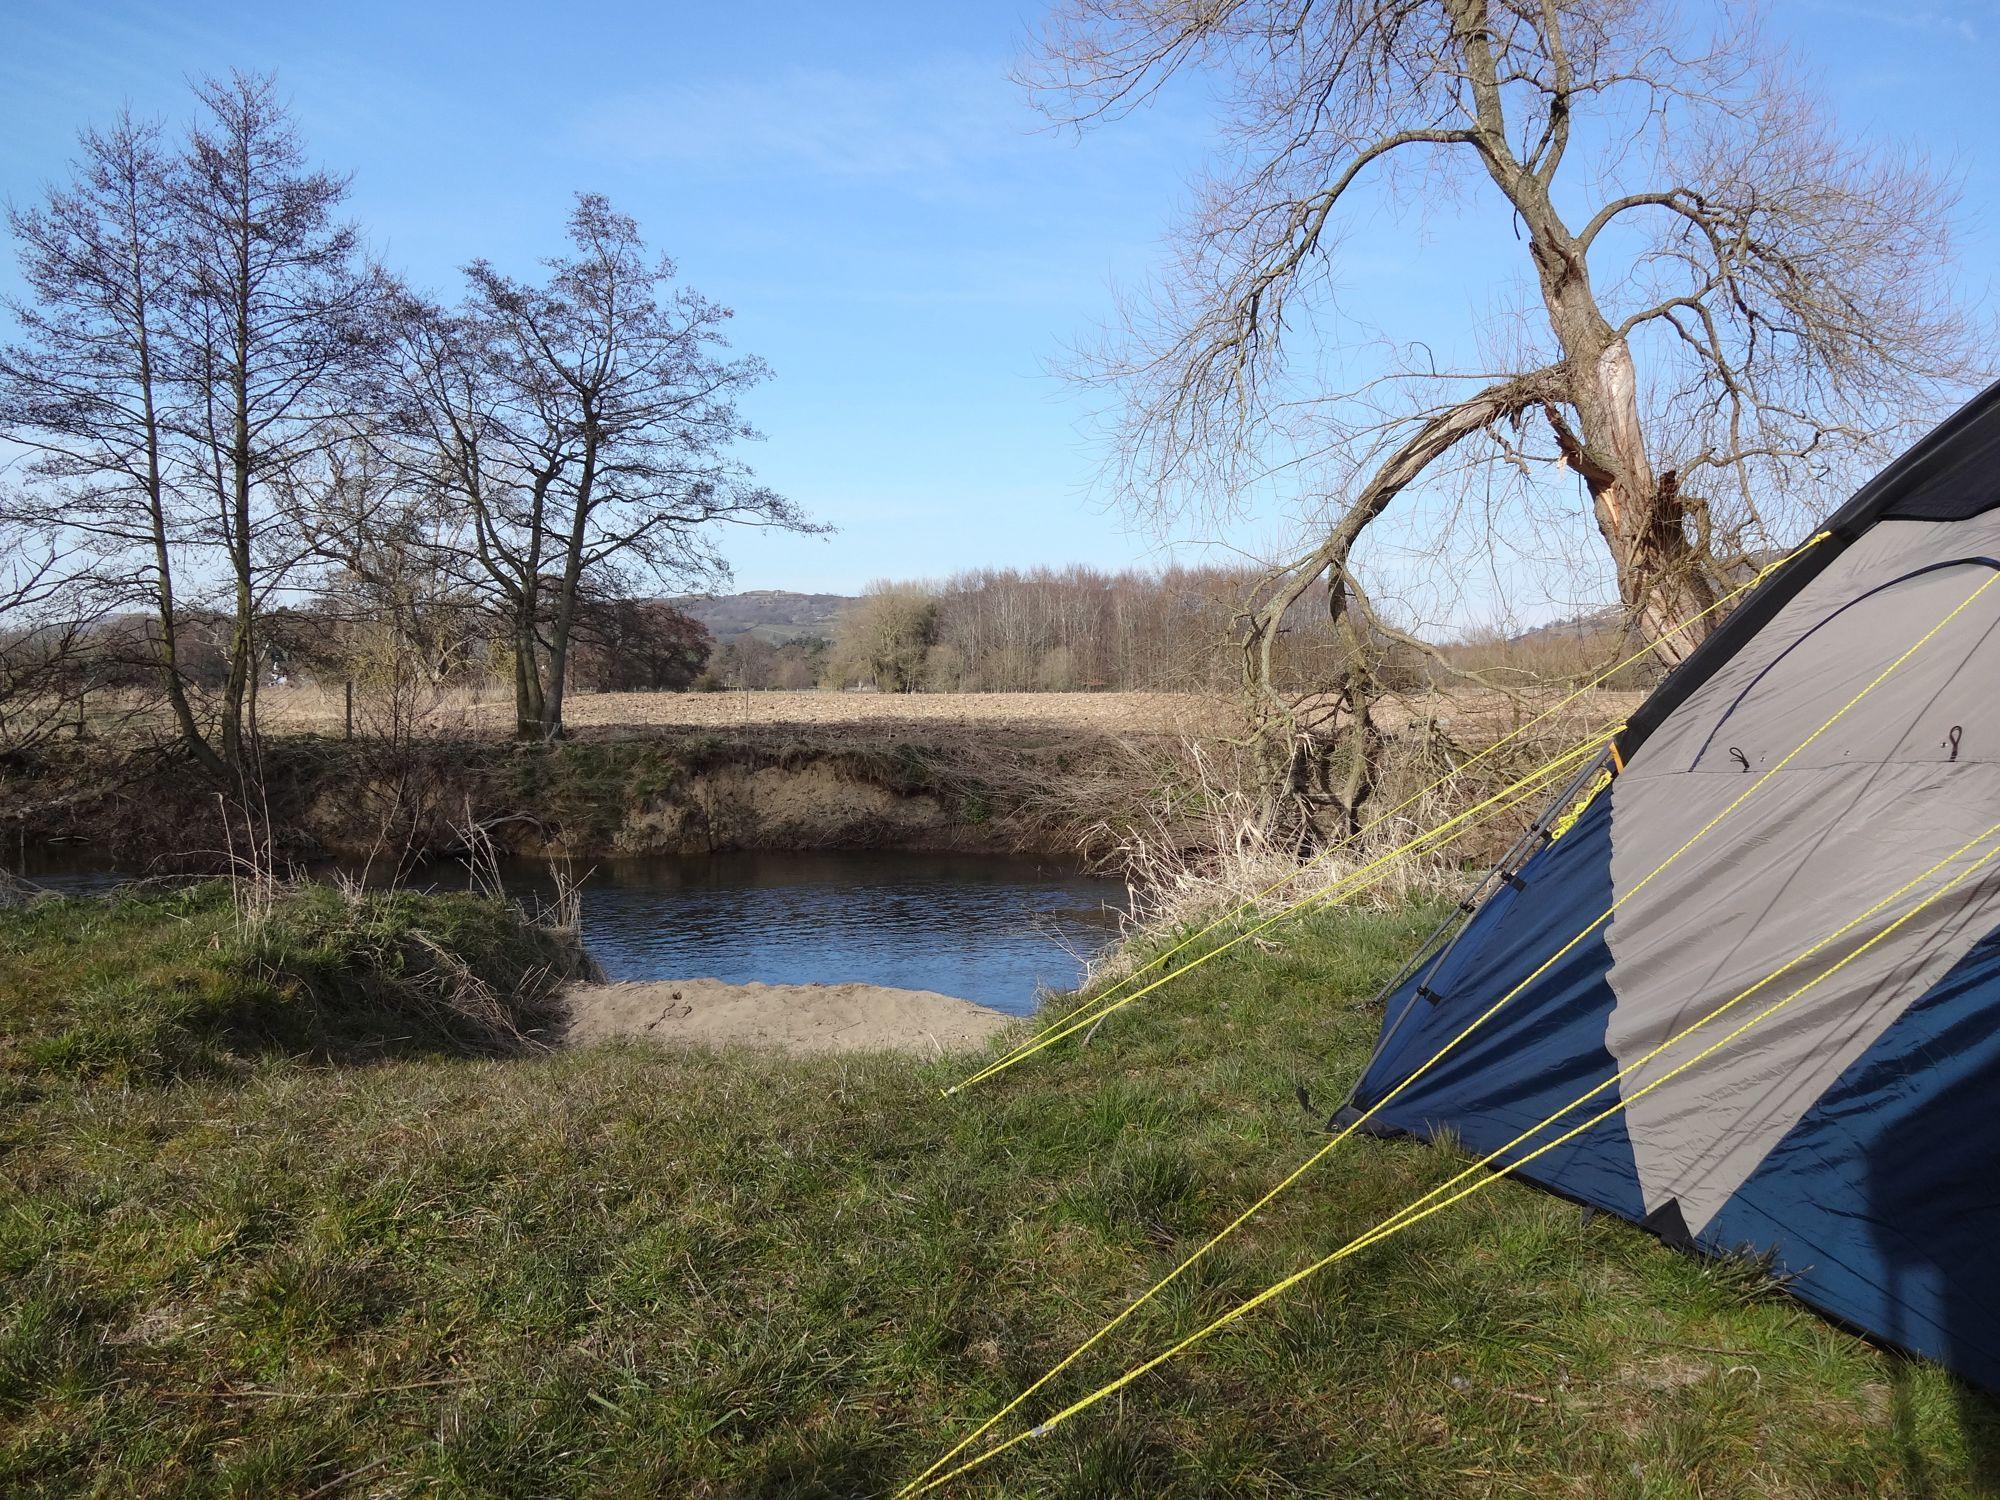 Campsites in Denbigh – Cool Camping